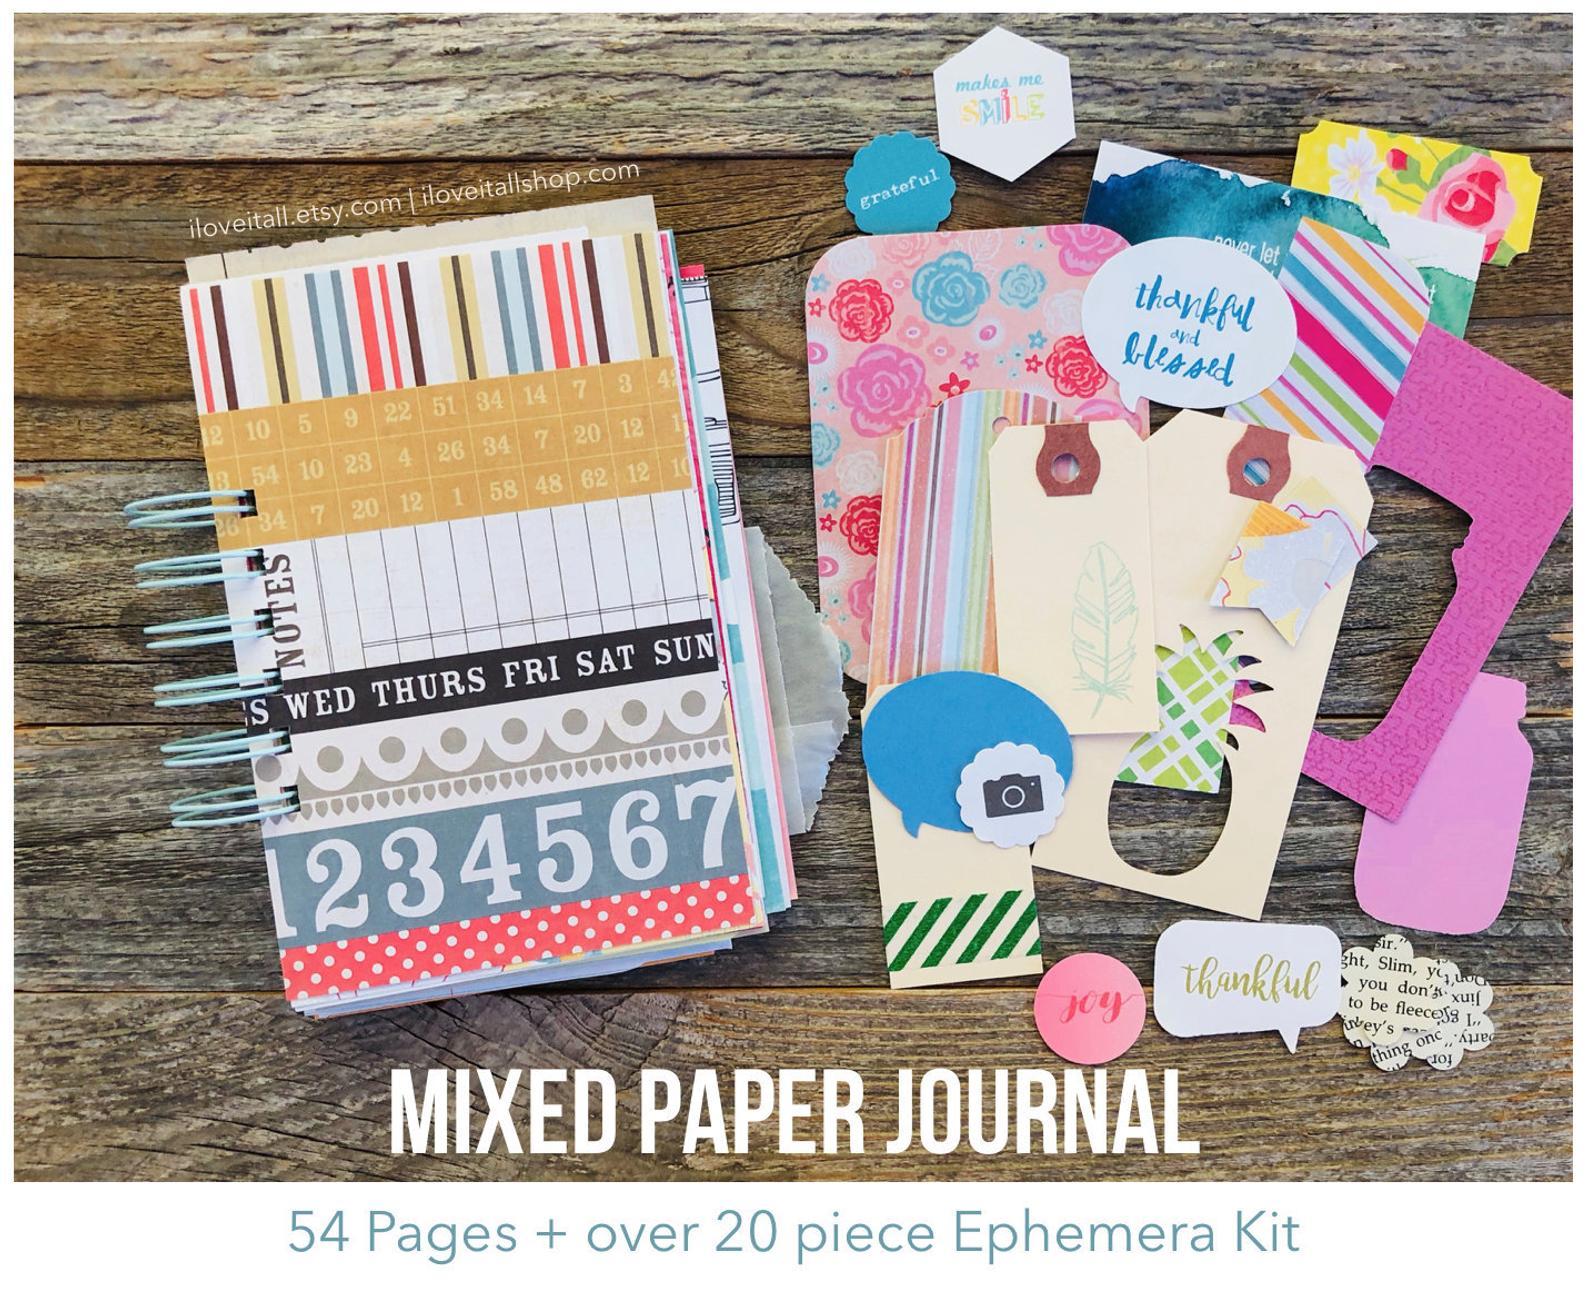 #gratitdue journal #gratitude #Journal #mindfulness #mixed paper journal #junk journal #smash book #smashbook #iloveitallshop